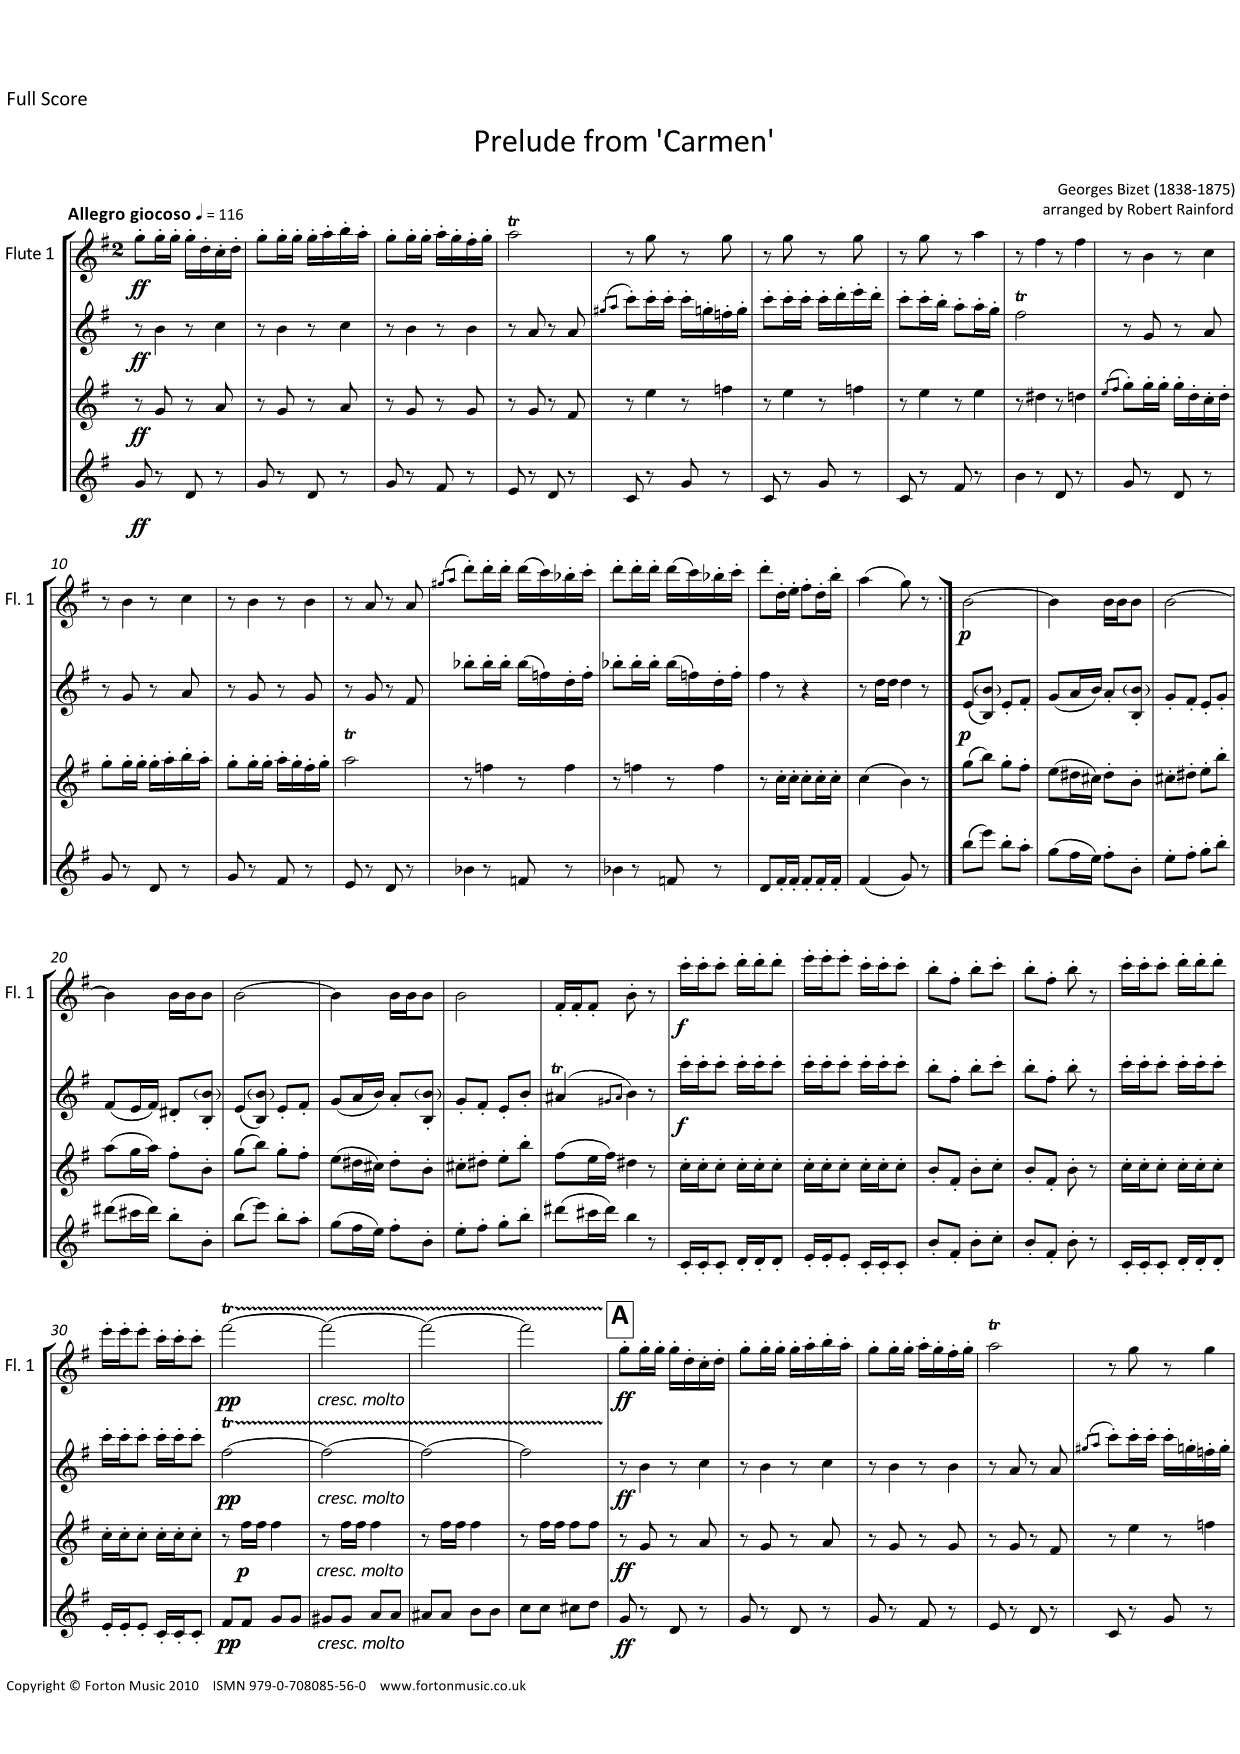 Prelude from 'Carmen'